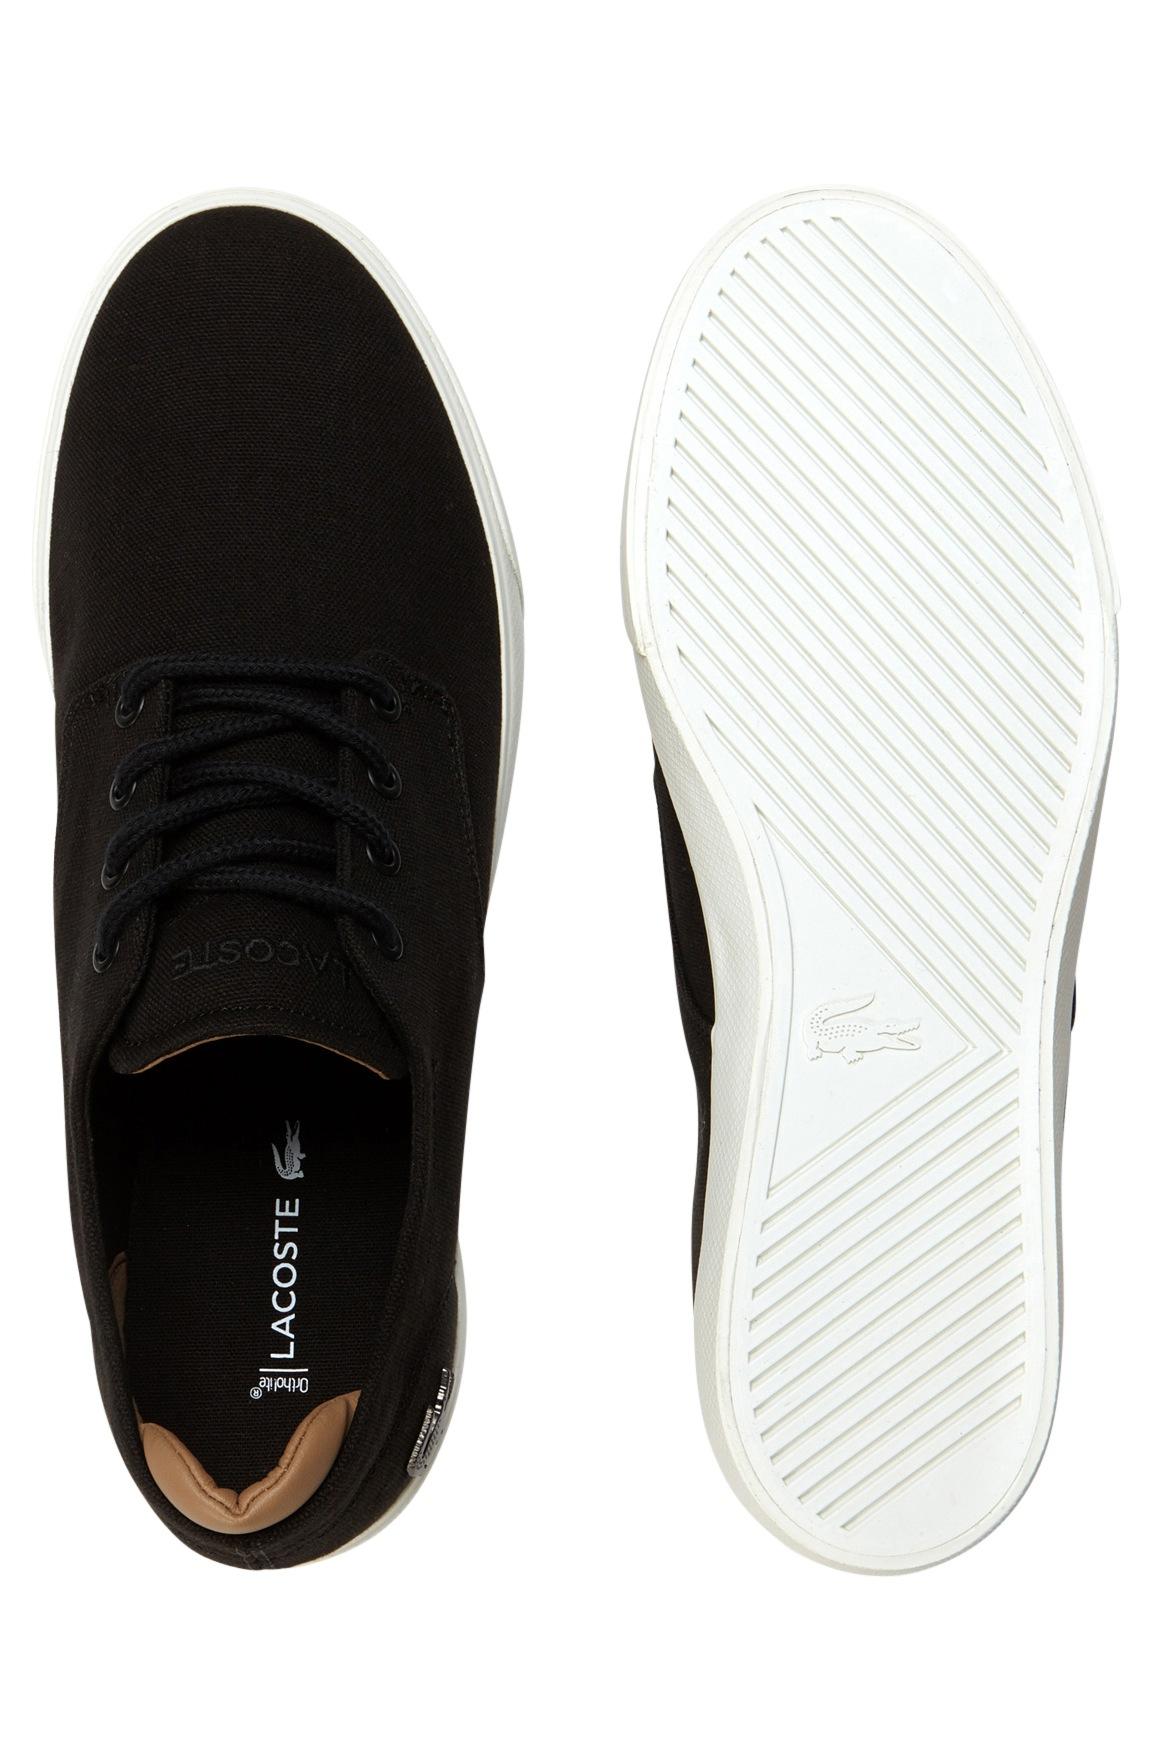 Lacoste Mens Shoes Myer